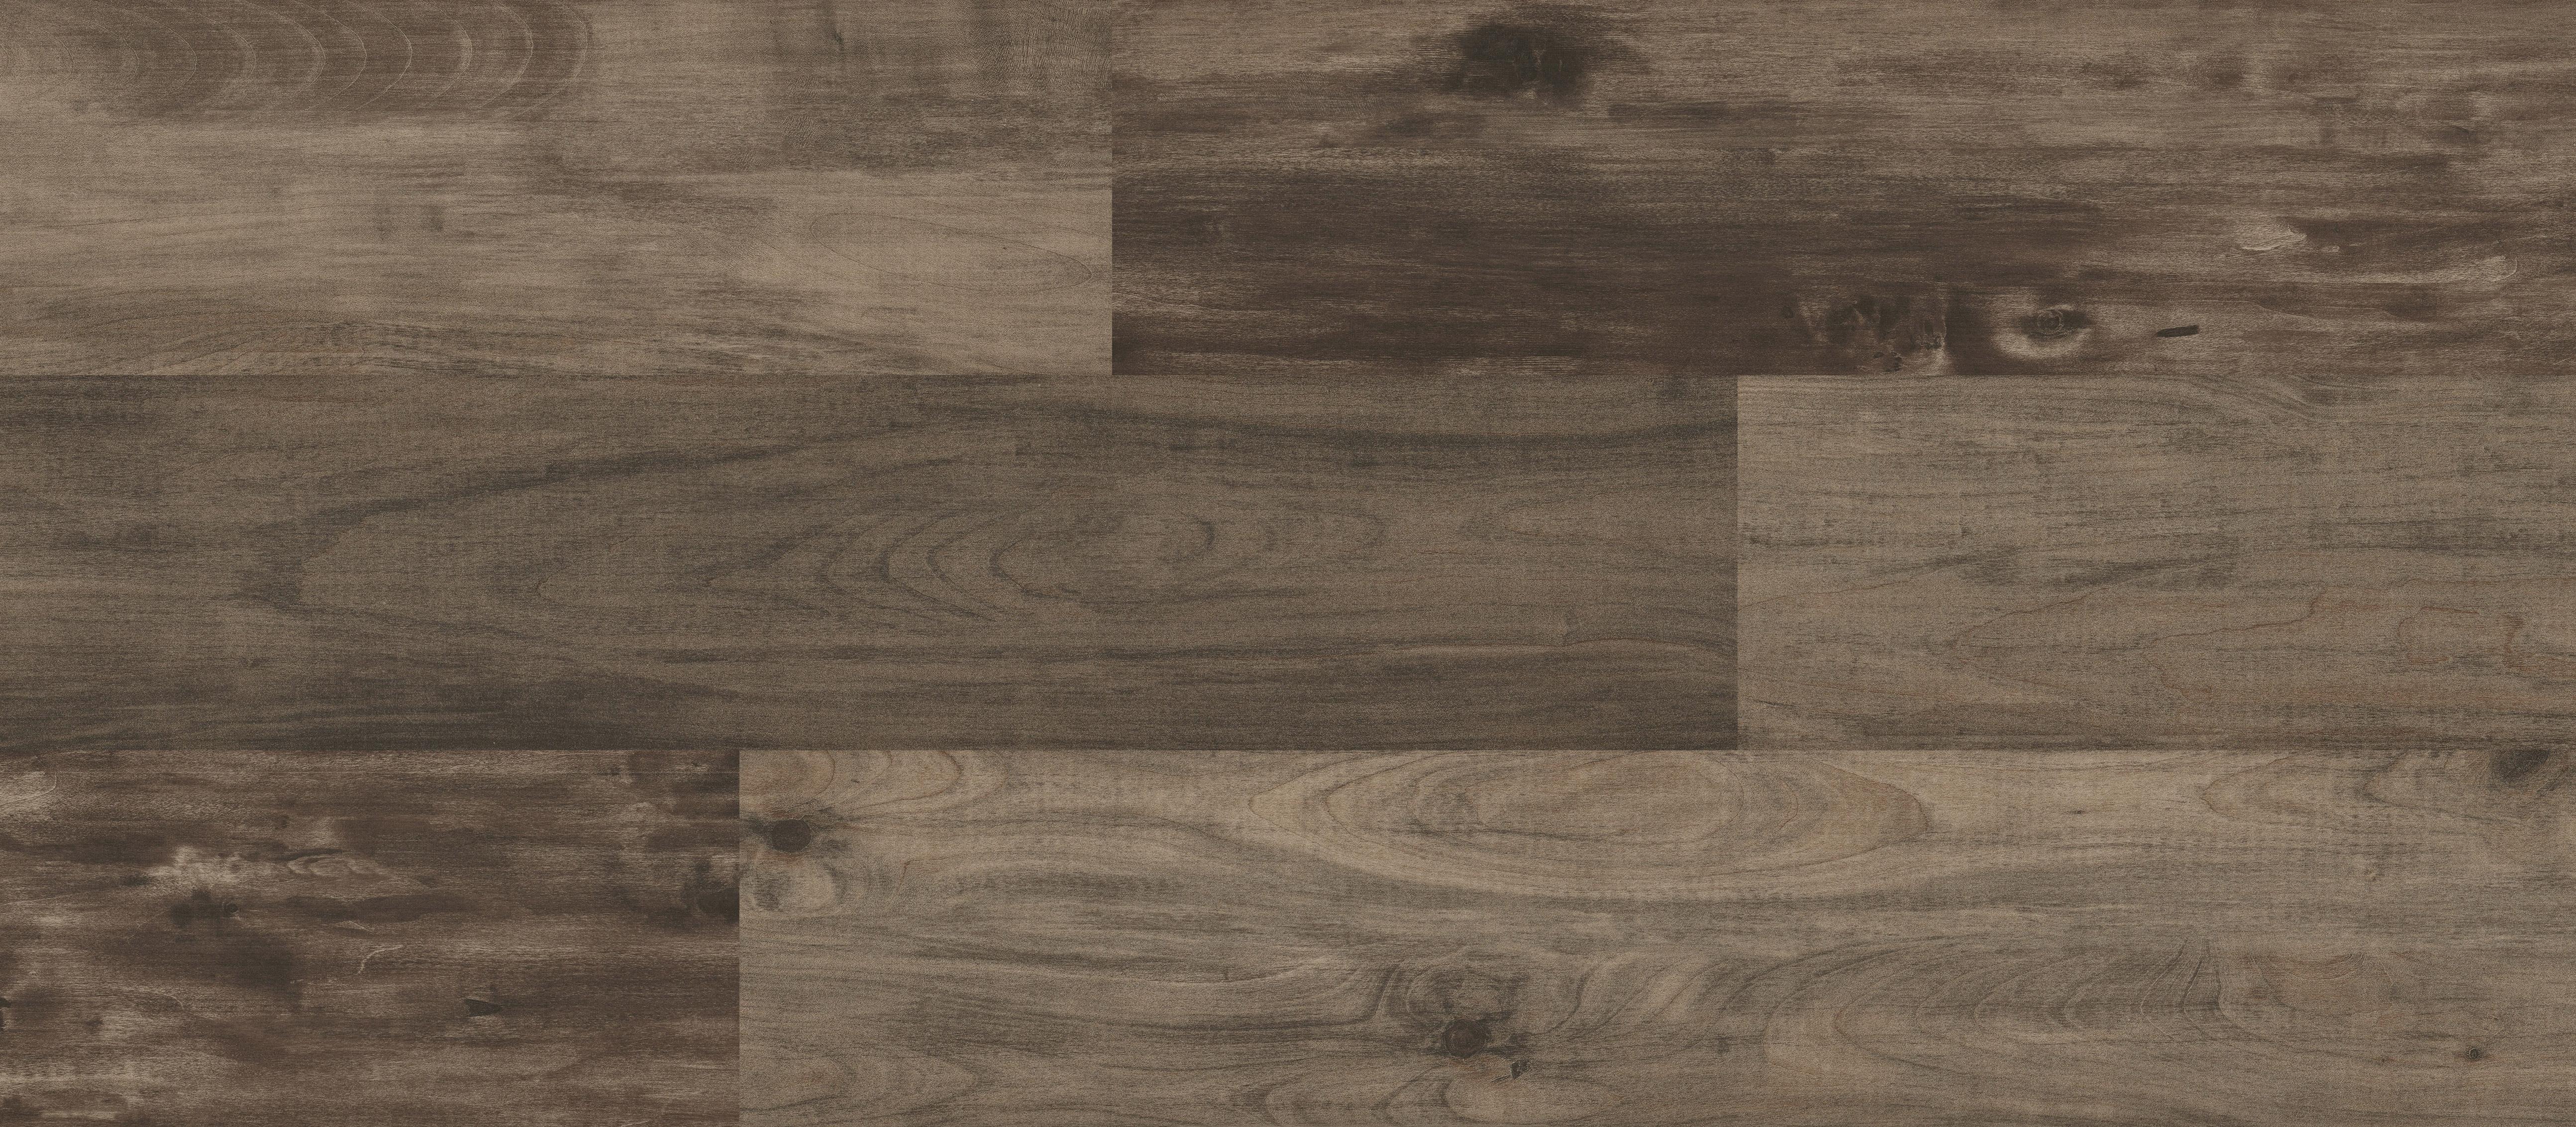 is hardwood flooring waterproof of ivc california walnut 7 56 waterproof click together lvt vinyl regarding ivc california walnut 7 56 waterproof click together lvt vinyl plank flooring